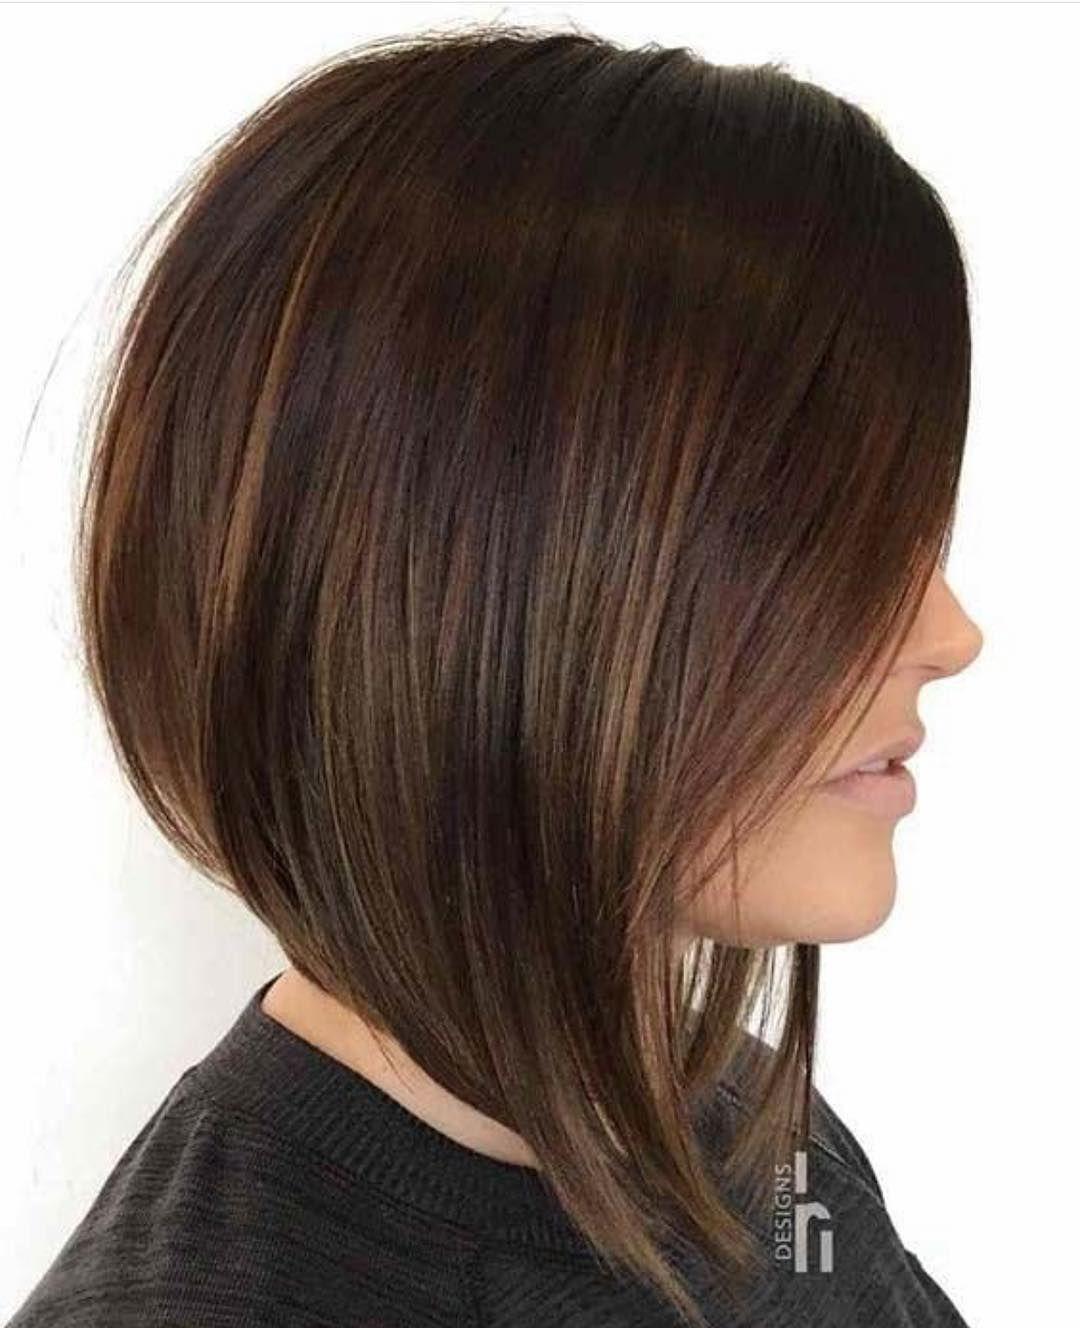 20+ Black hair bob hairstyles 2018 ideas in 2021